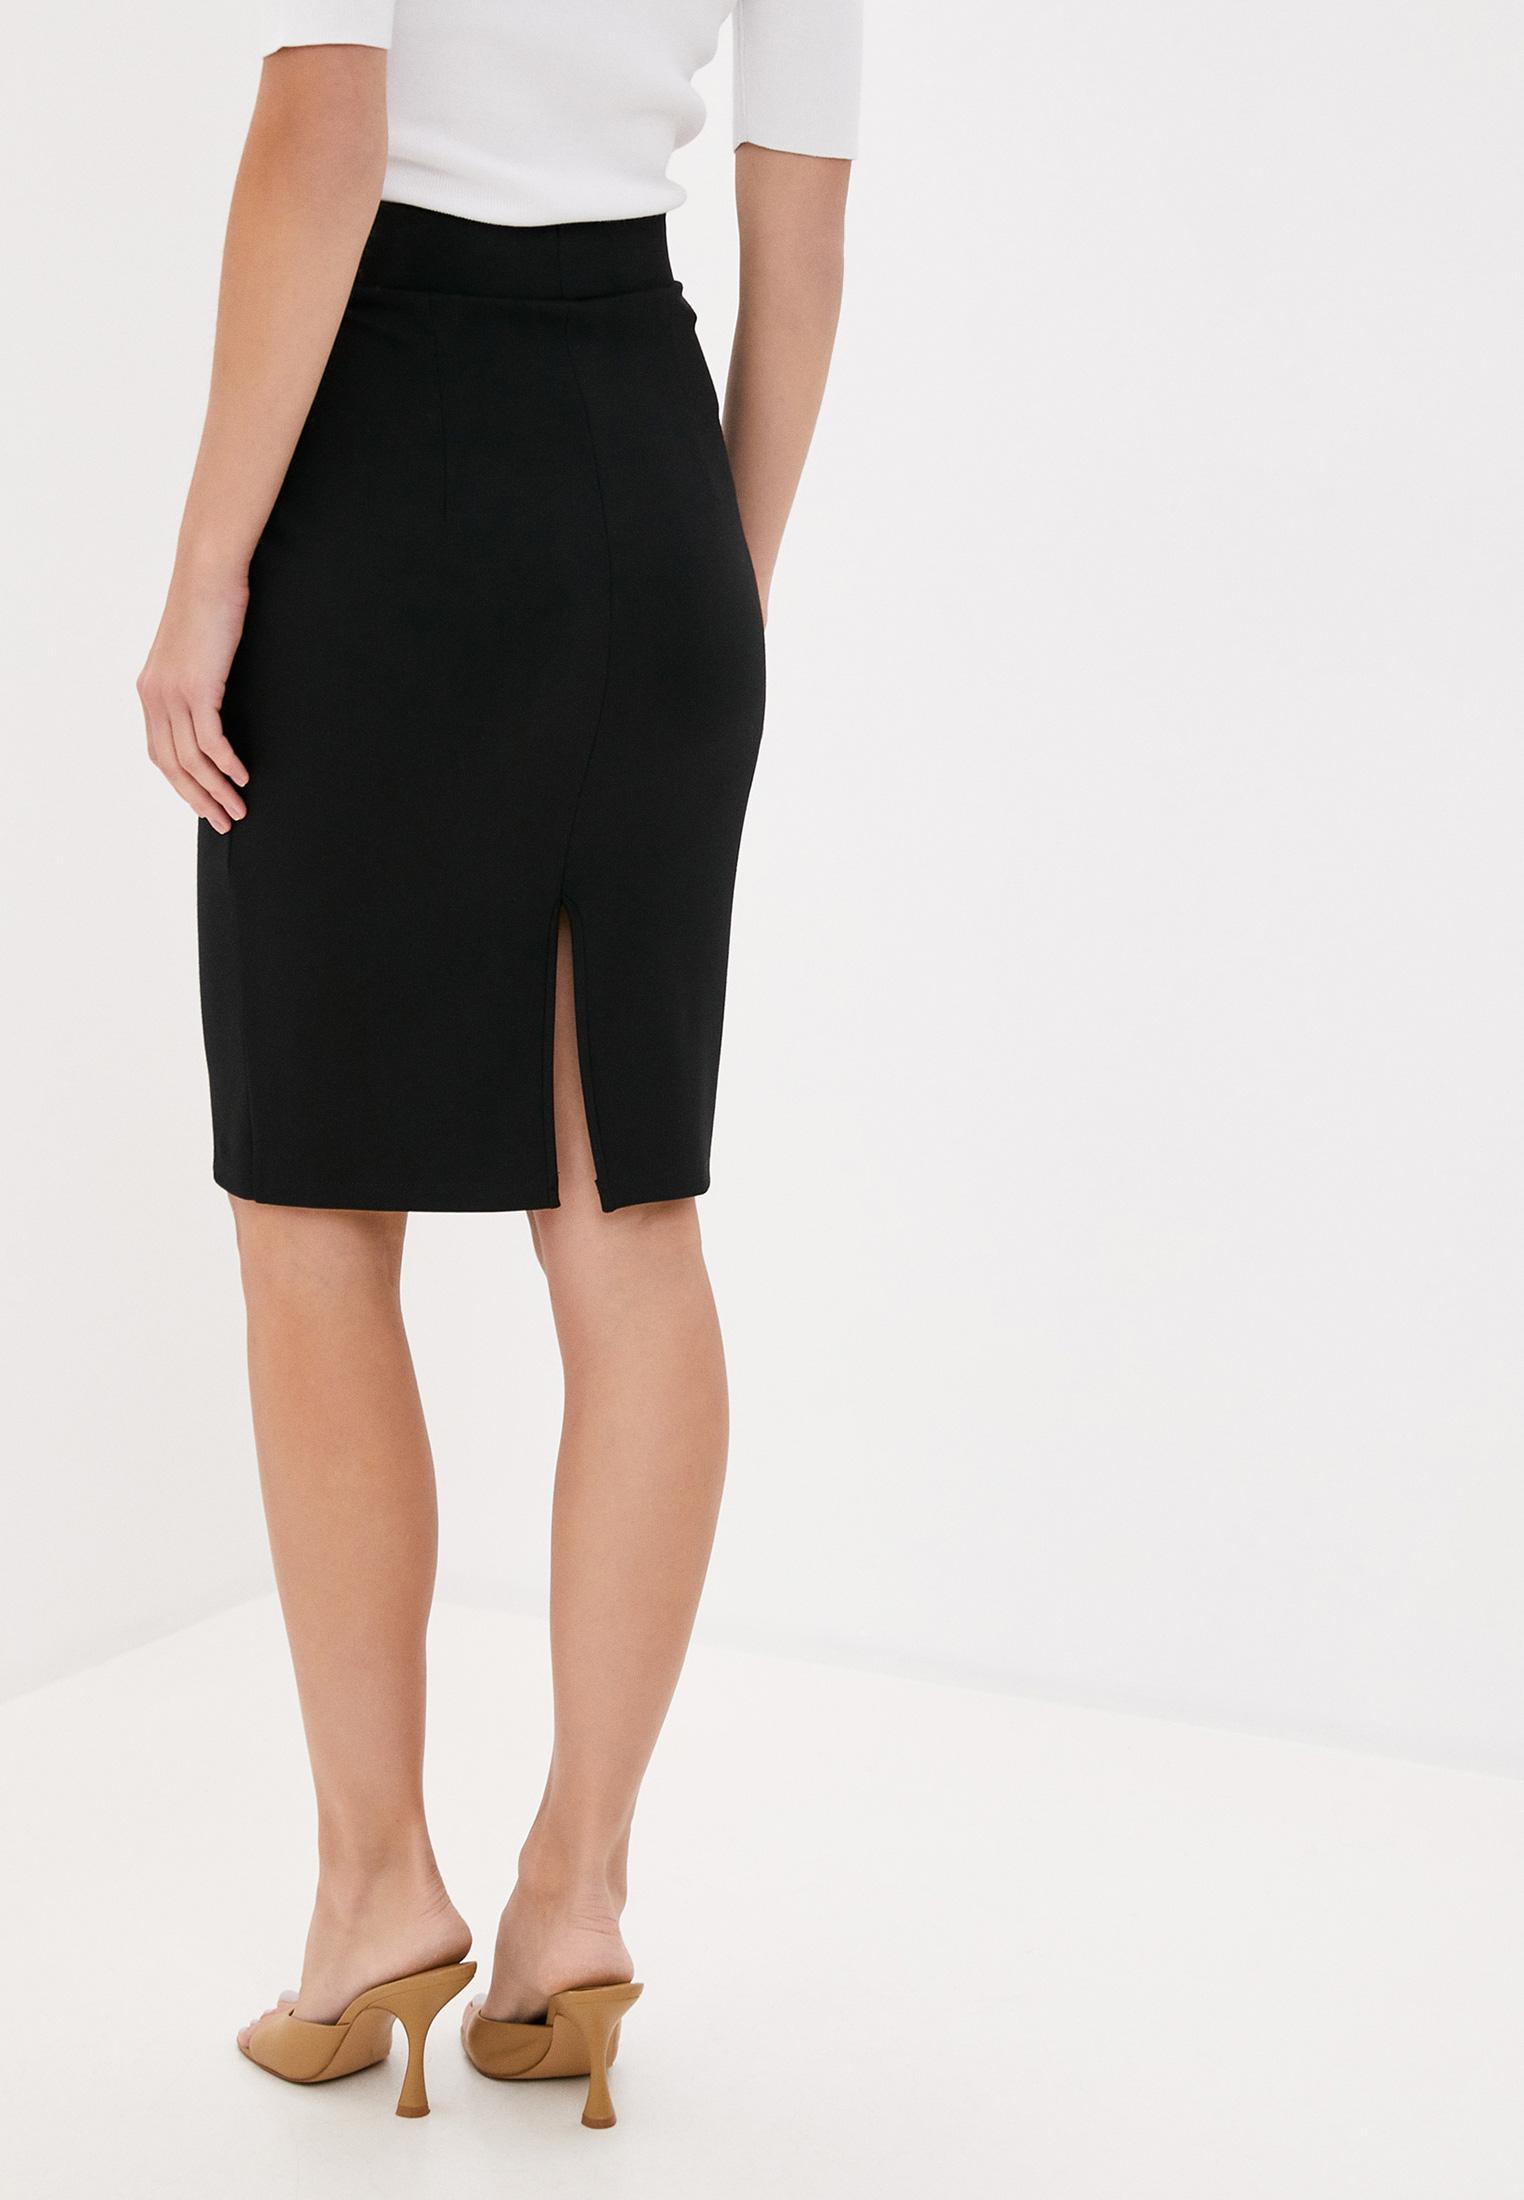 Узкая юбка Toku Tino TT8518025/: изображение 3